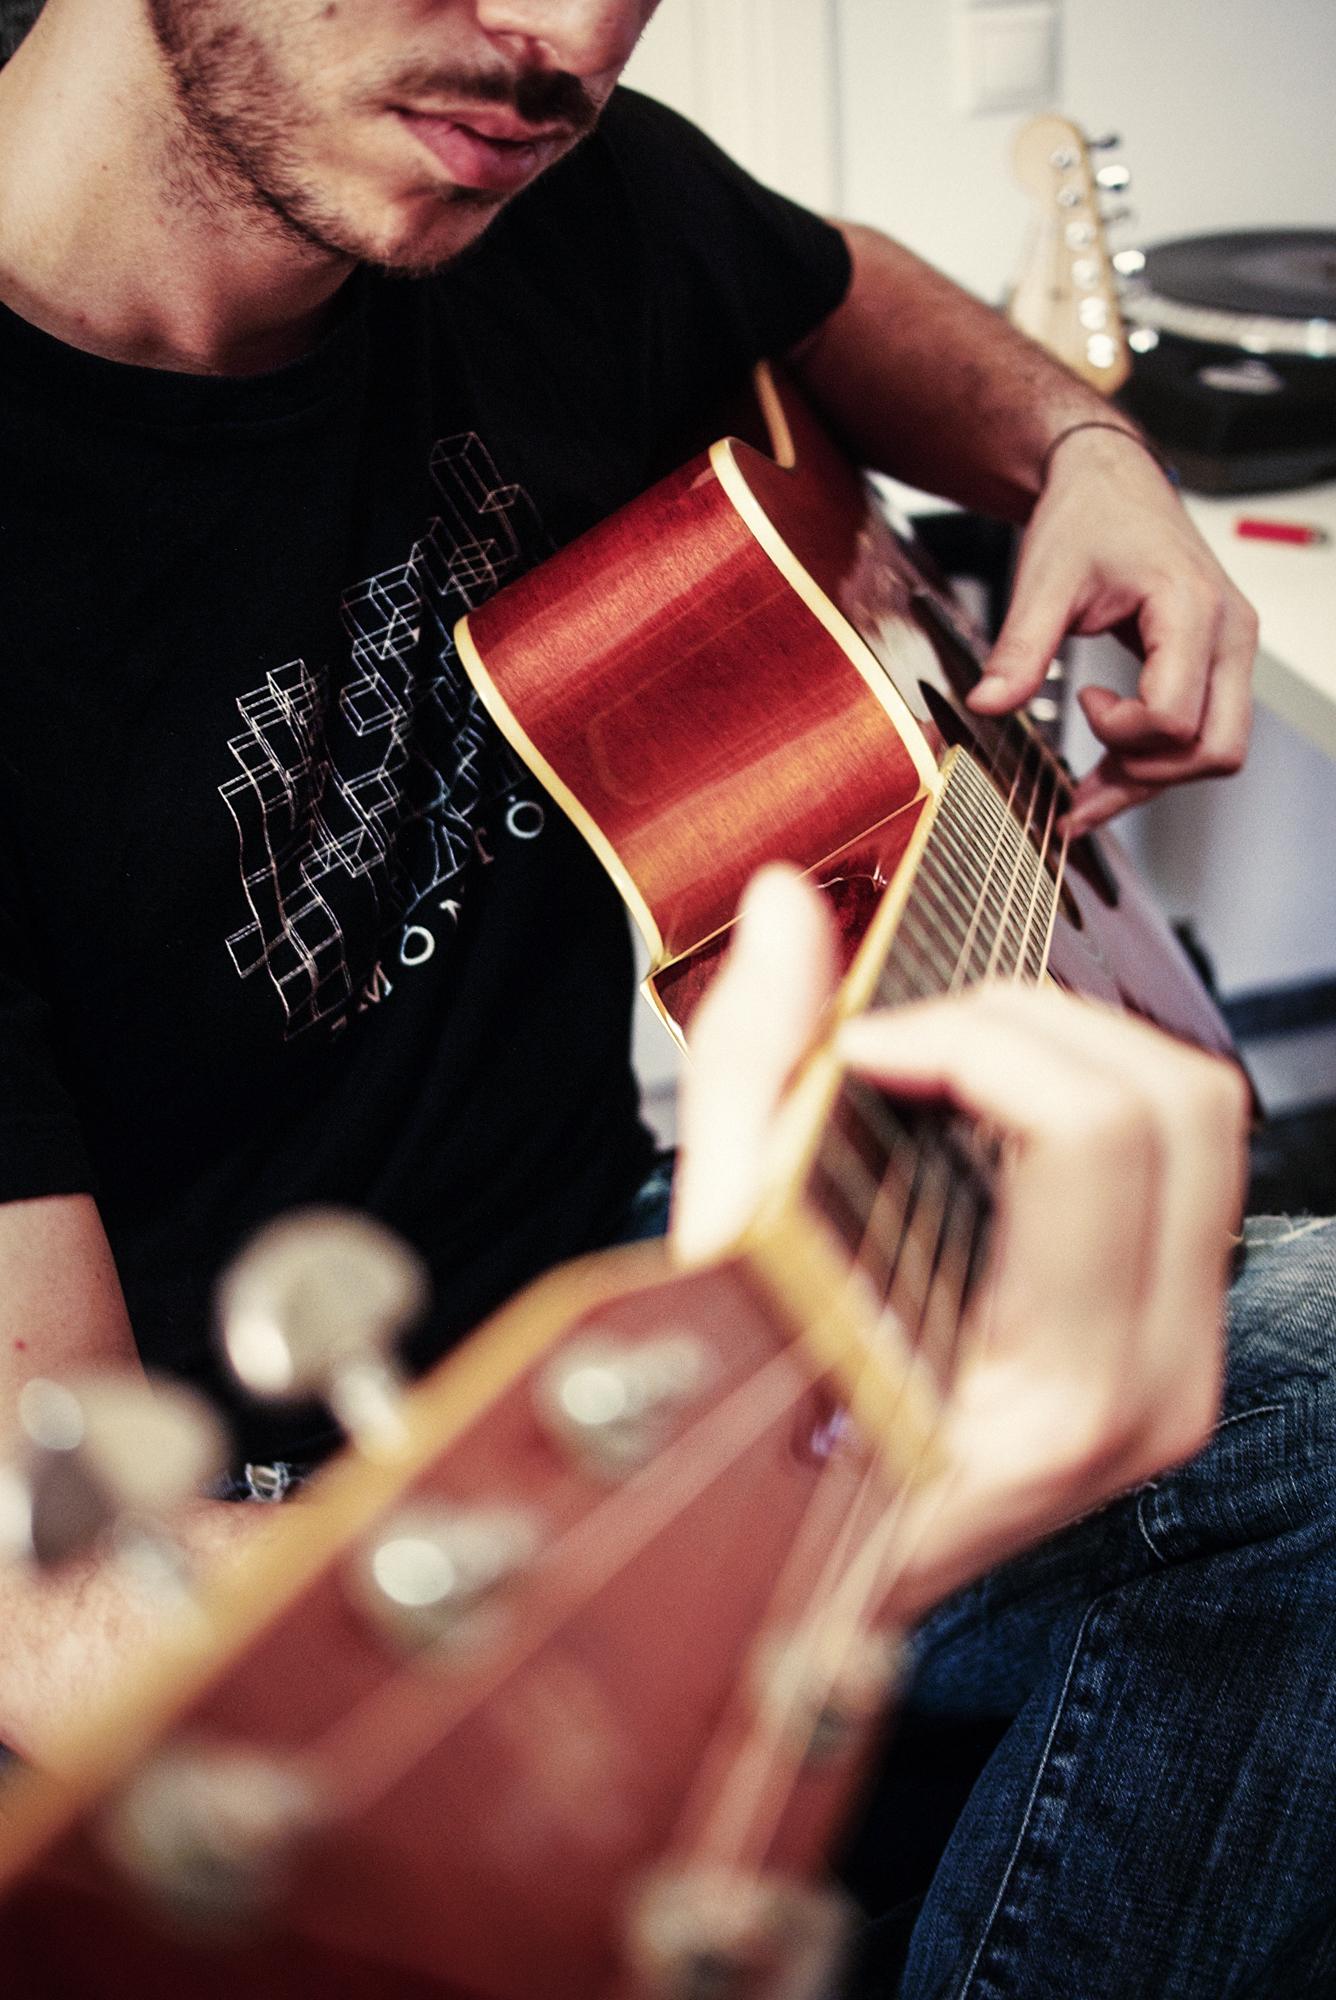 Adding some acoustic guitar arpeggios